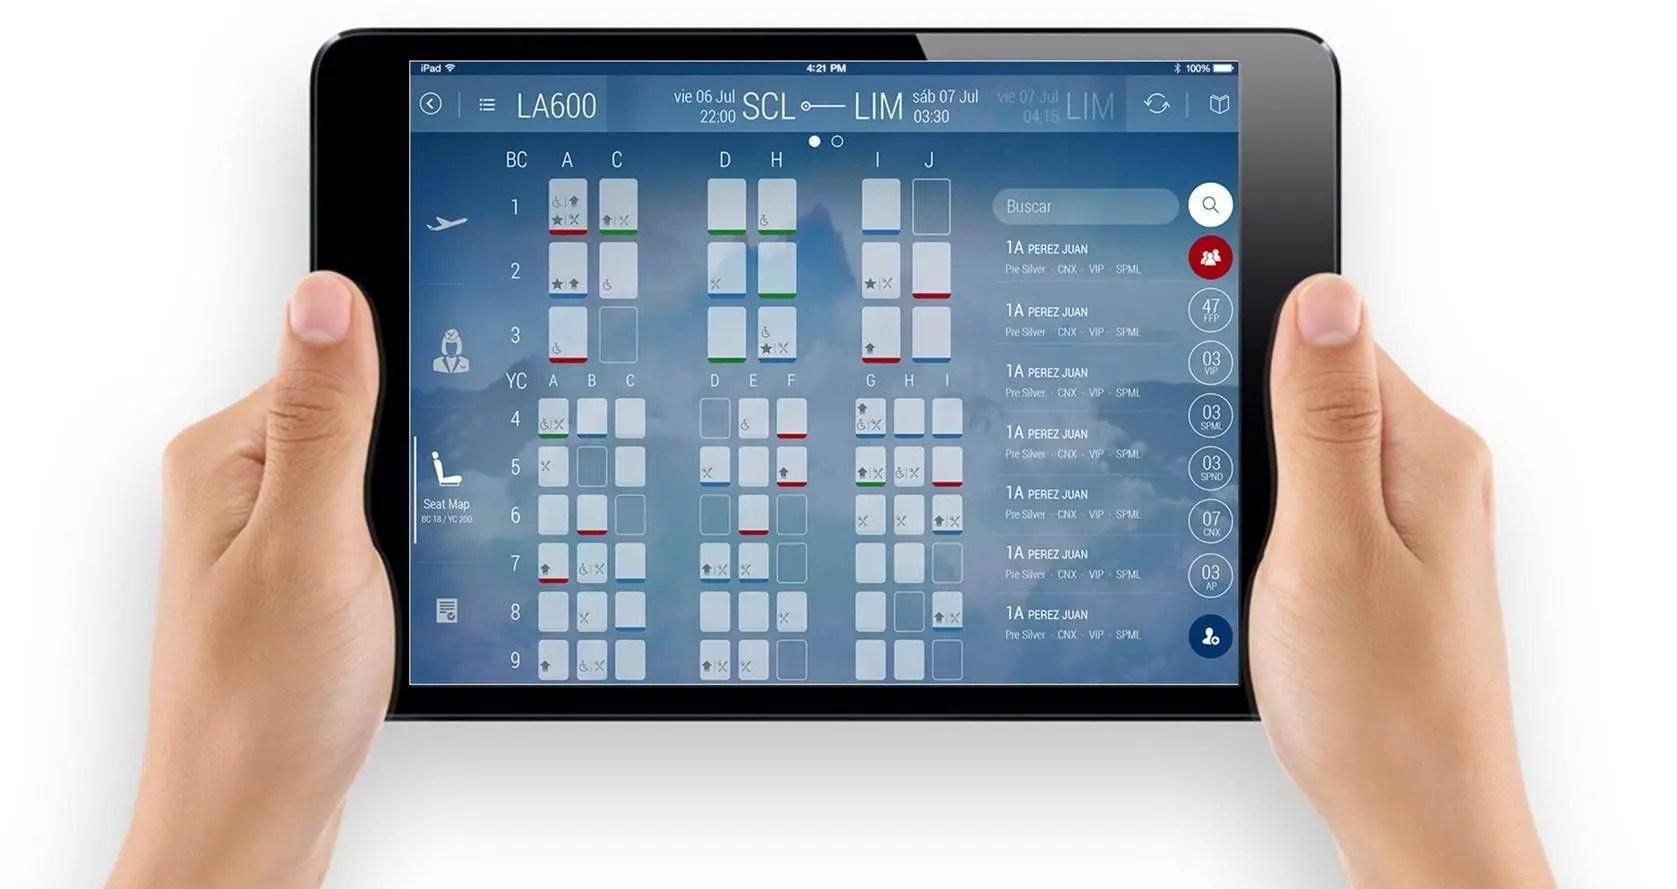 Proyecto Tablets para Tripulantes de Cabina - Grupo LATAM